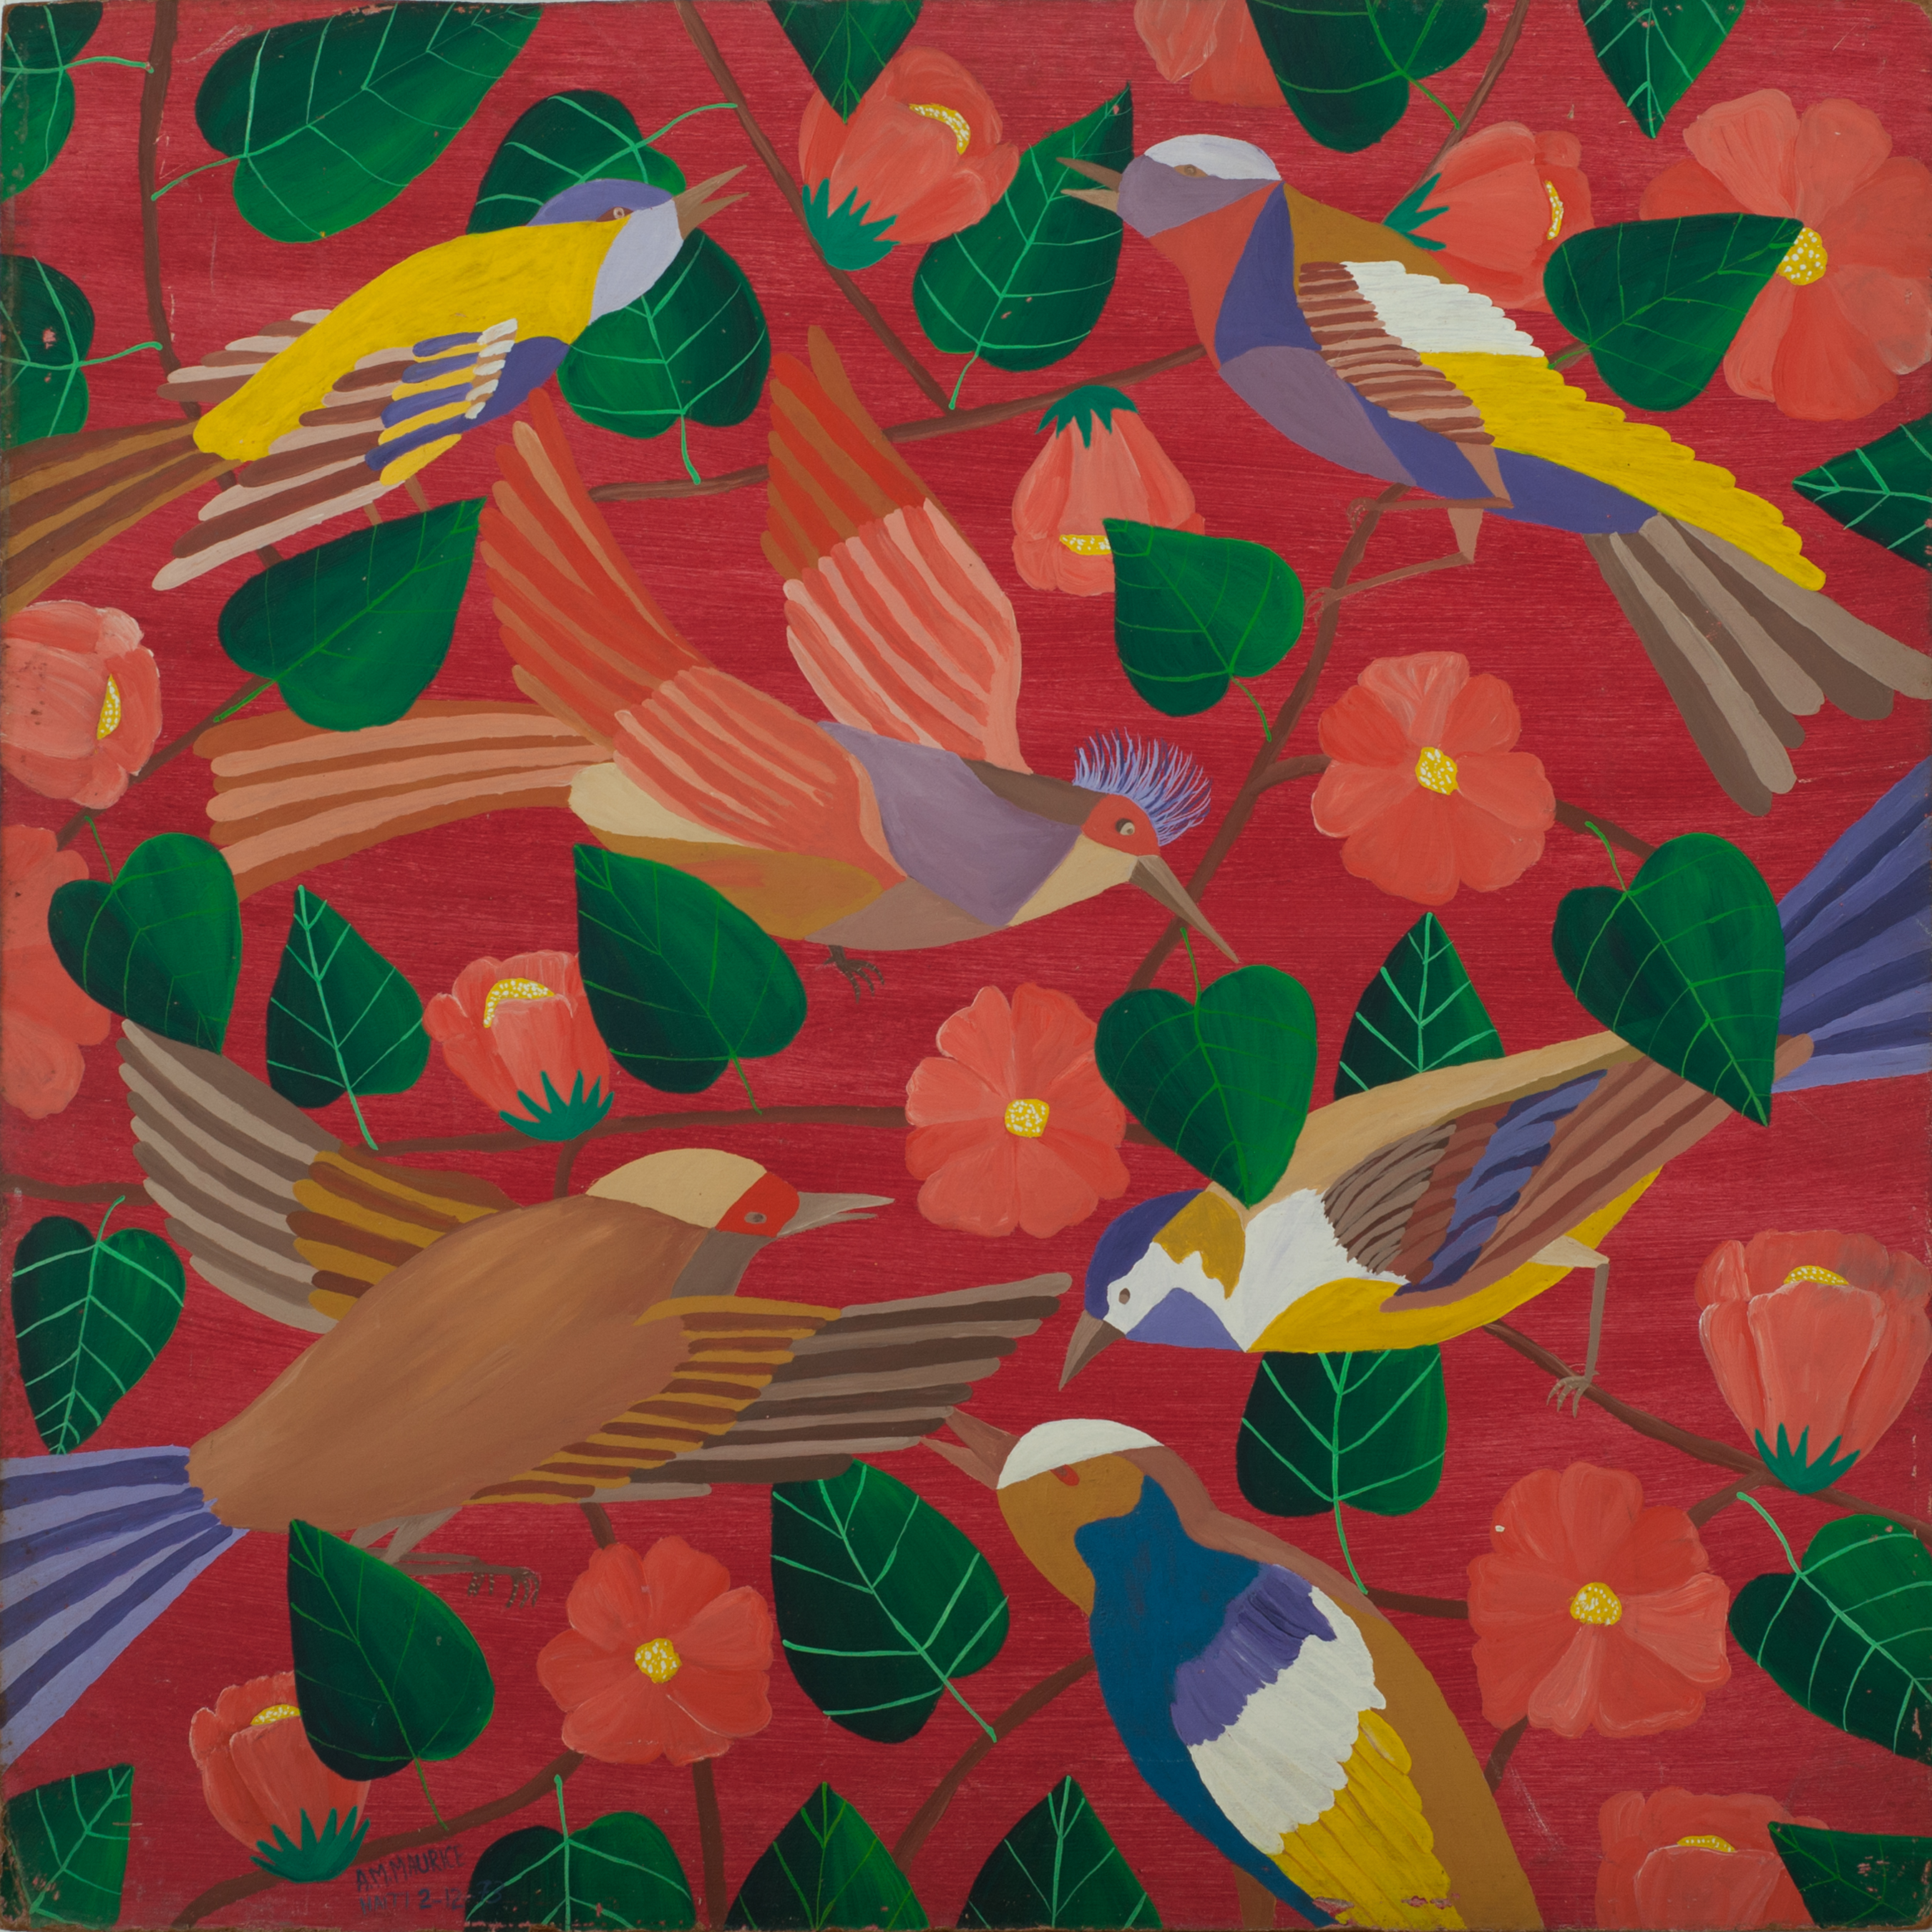 Maurice A.M. 24X24 #101-3-96 Board 1973.